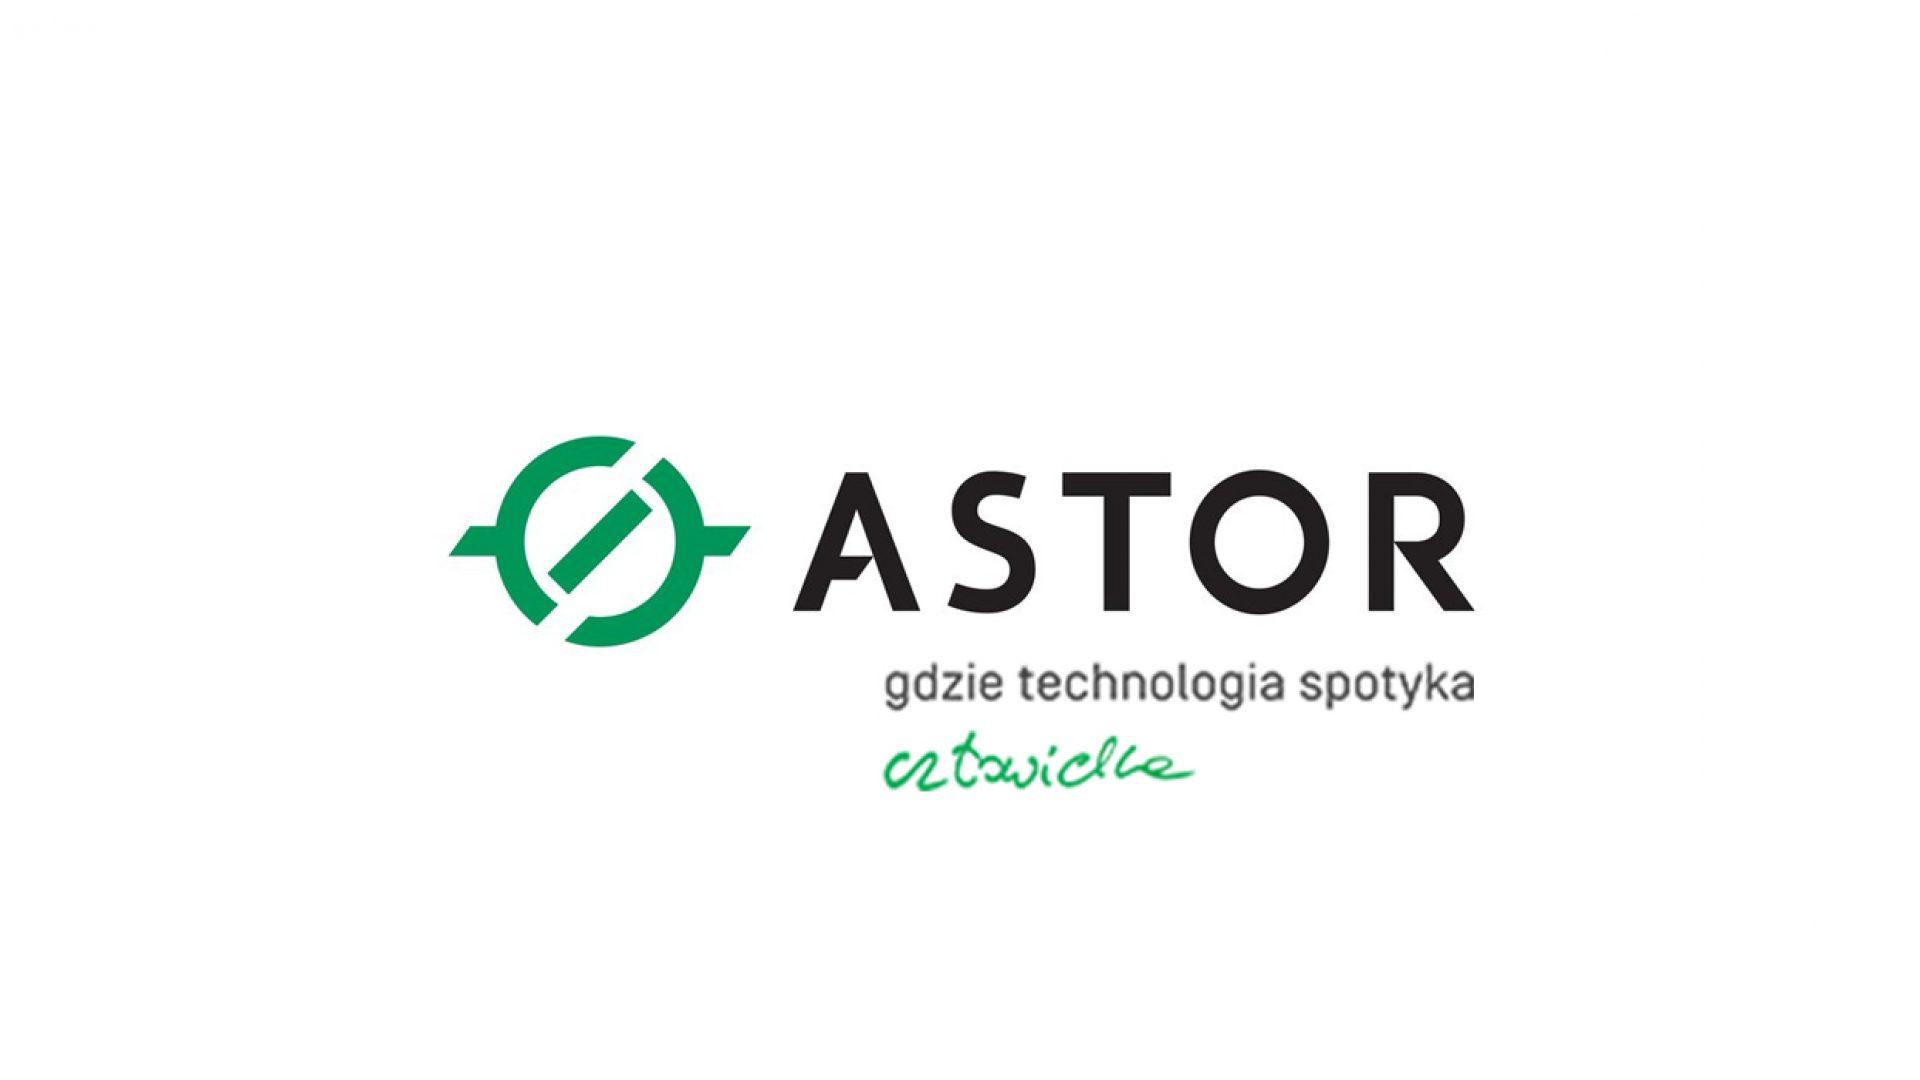 ASTOR_iautomatyka_Baner-1-1920x1080